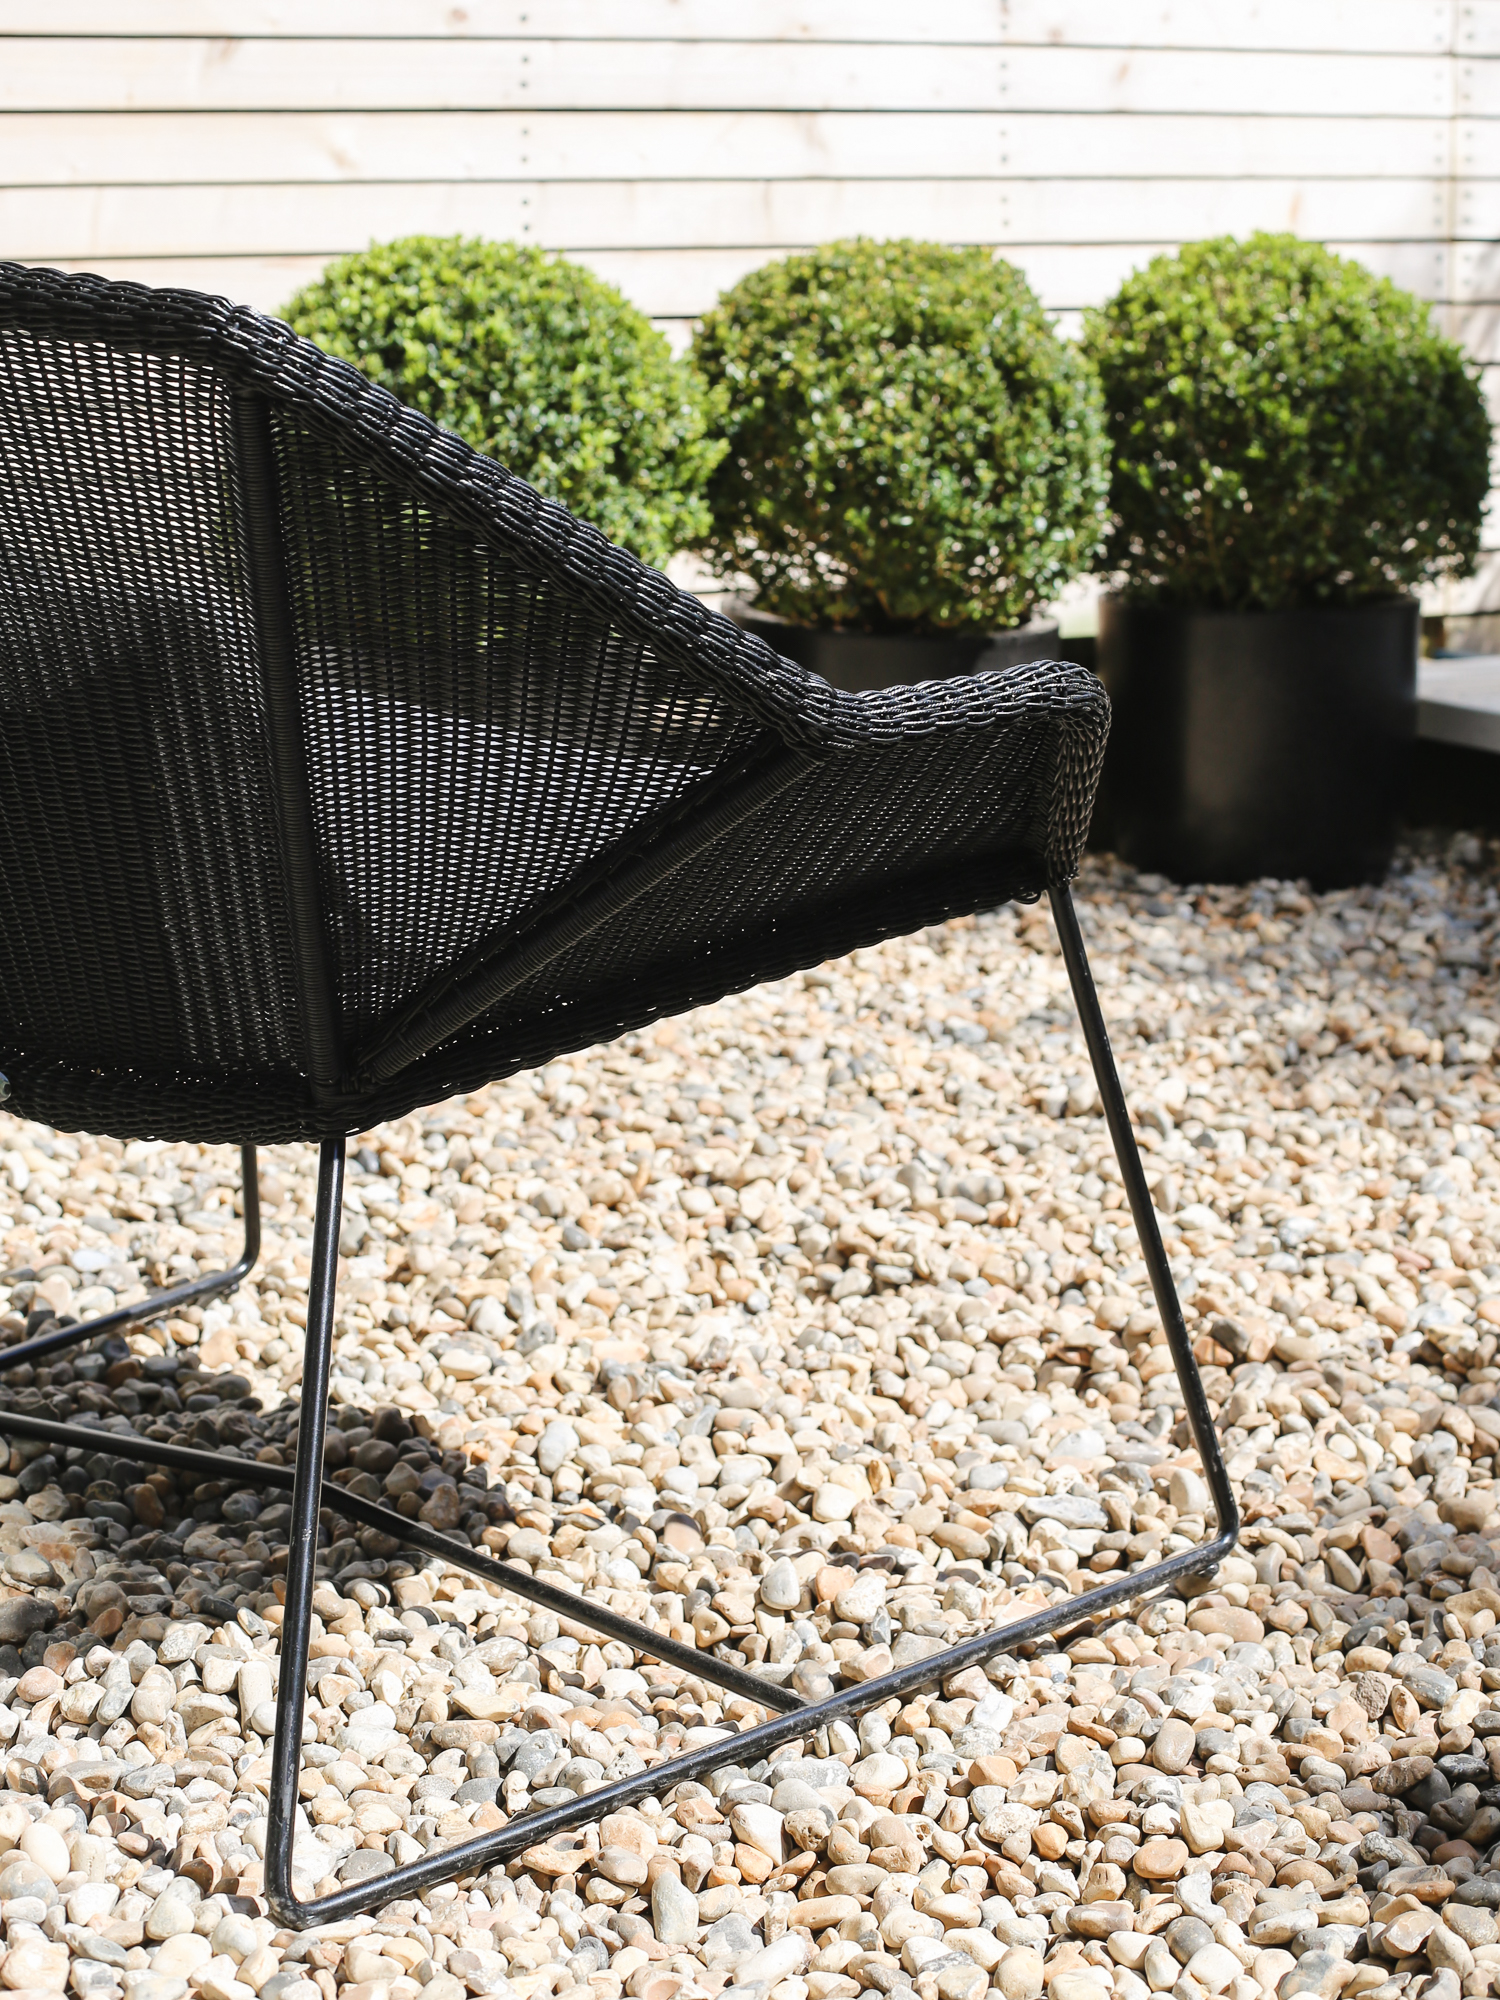 Black rattan Danish garden chair by Cane-line | Design Hunter